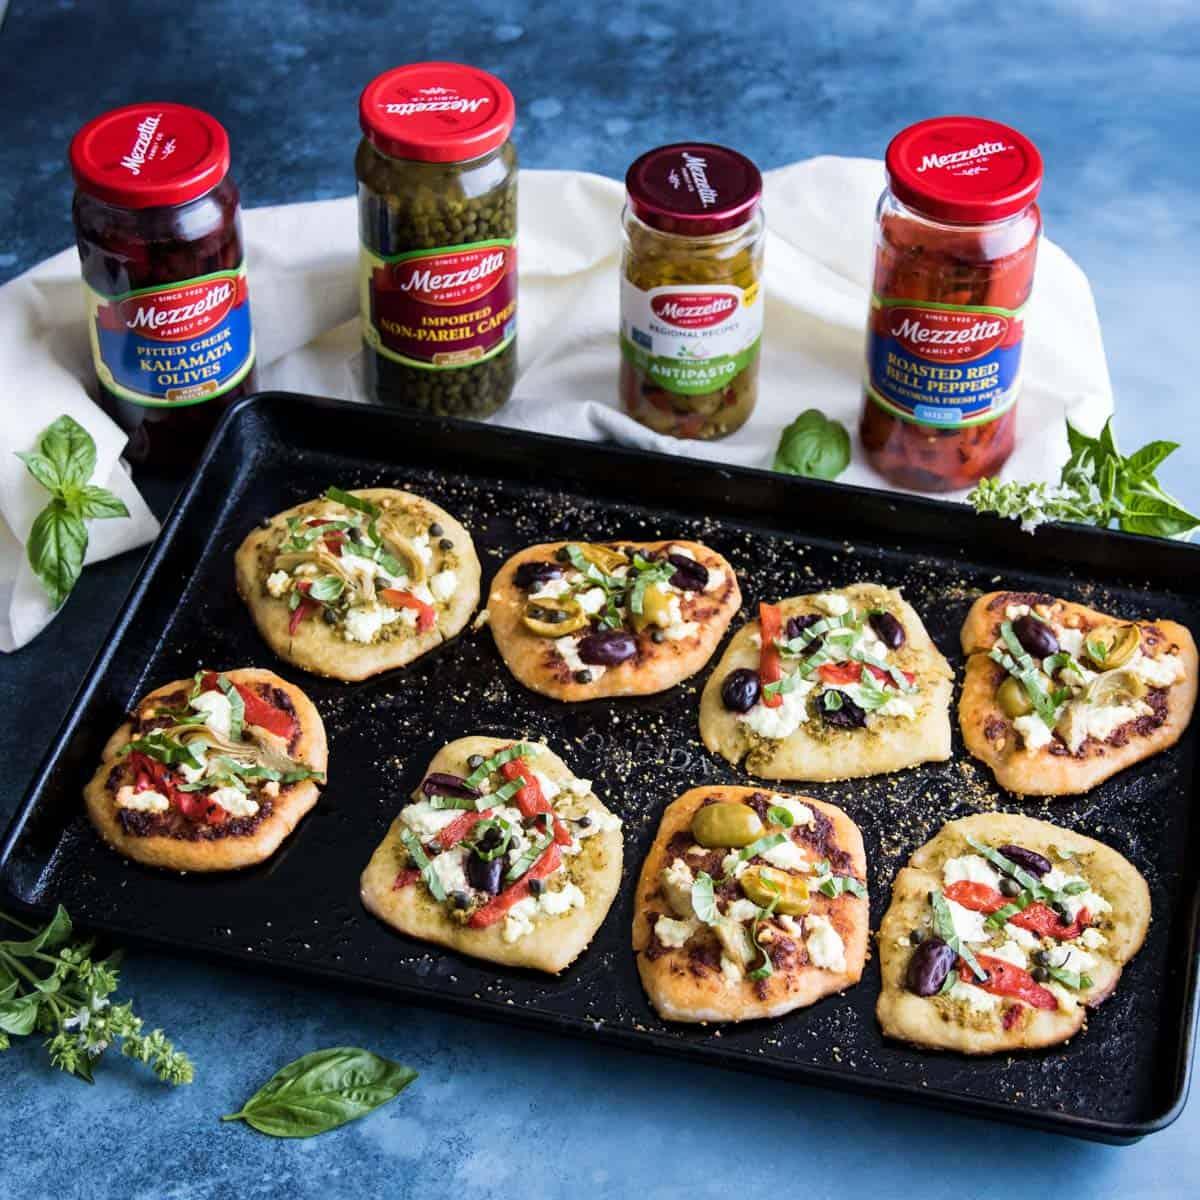 mini sourdough pizzas on a sheet pan with jars of Mezzetta ingredients